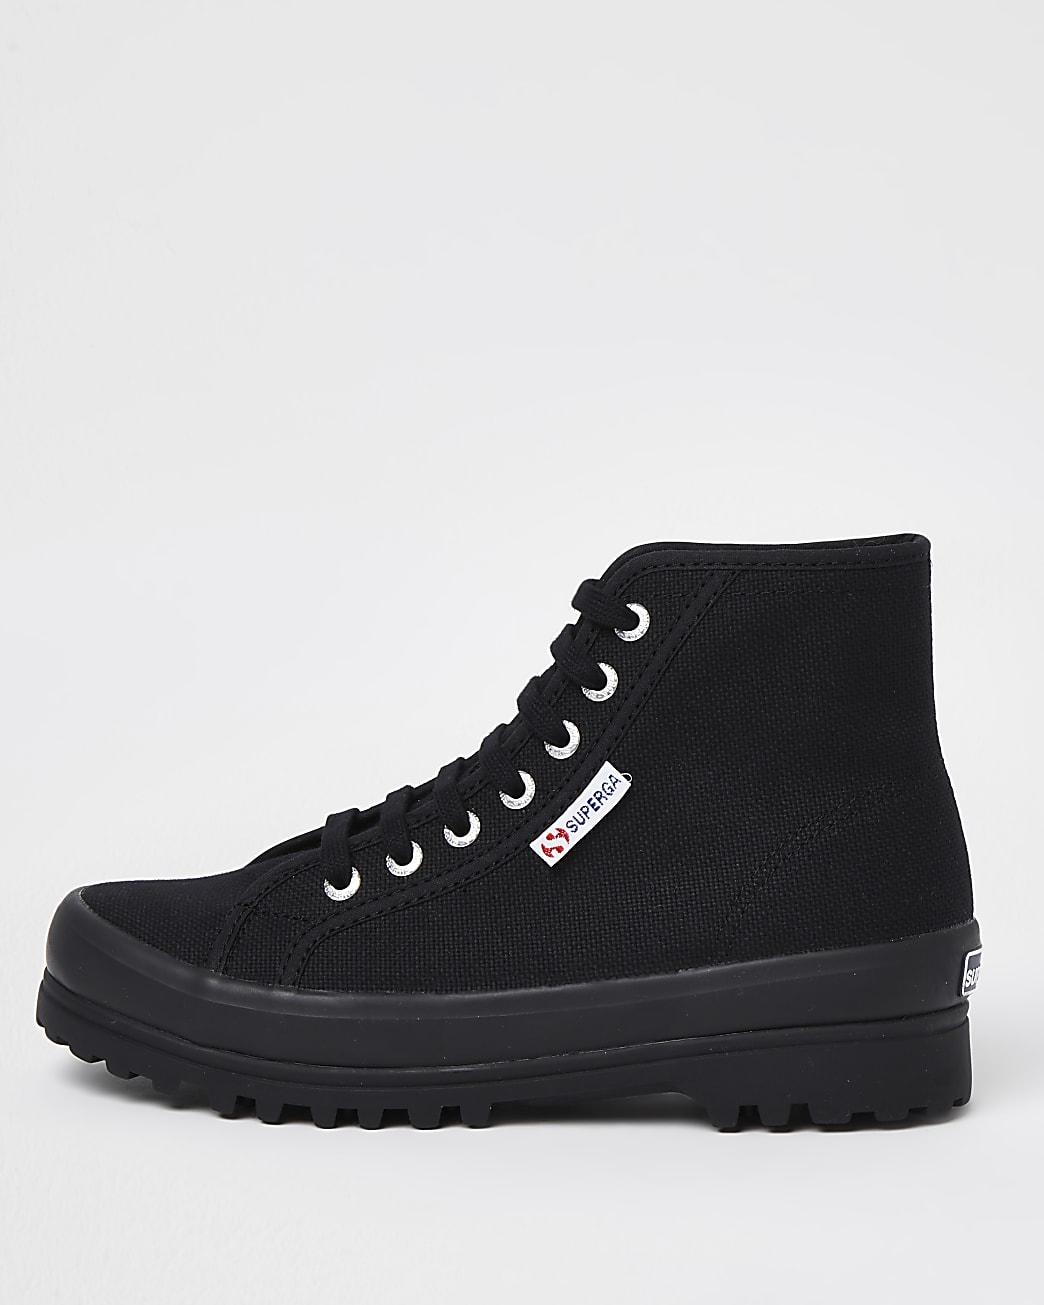 Superga black drench boot